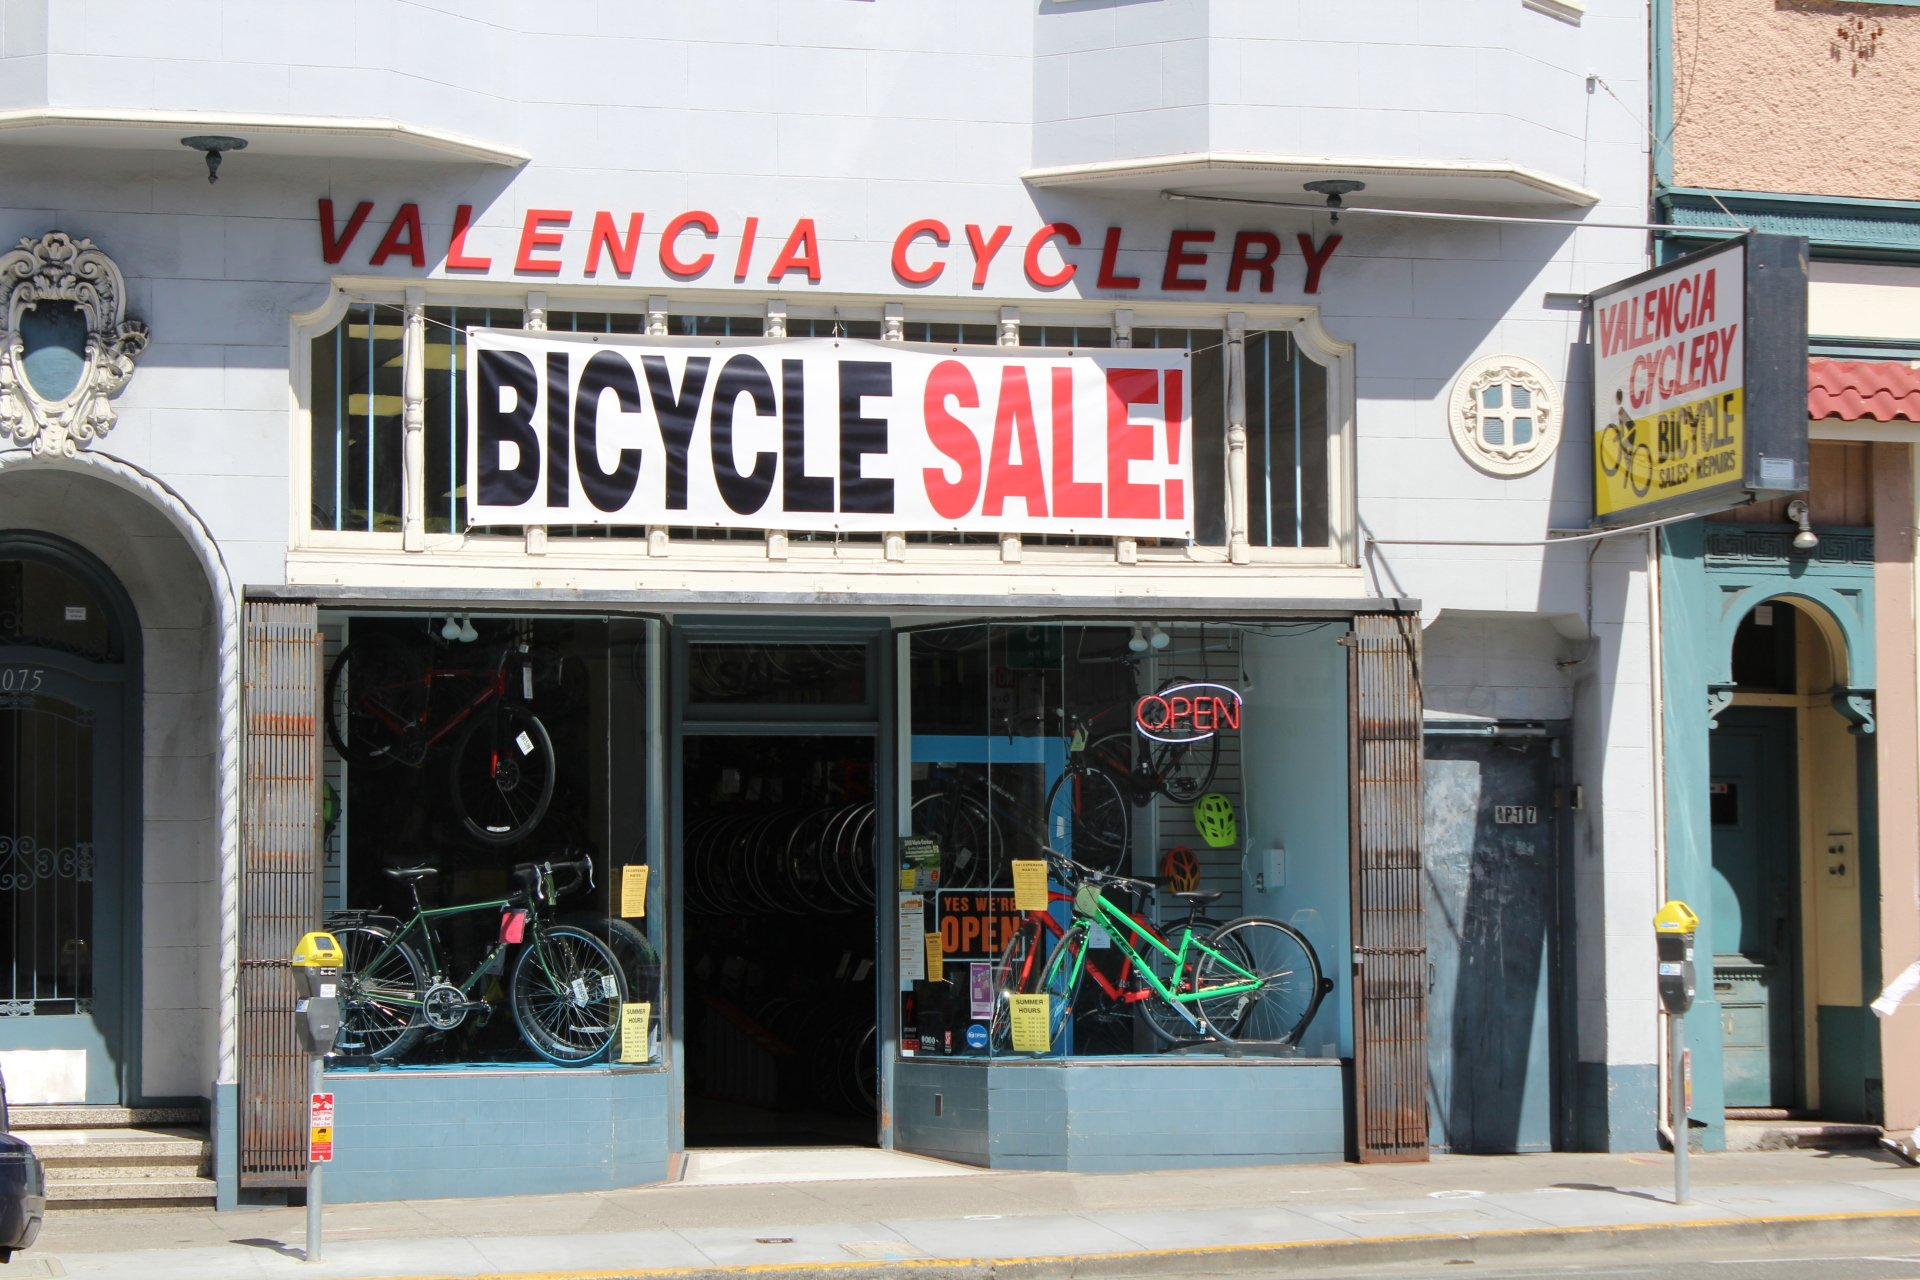 Bike Shop & Bike Repair San Francisco, CA - Valencia Cyclery